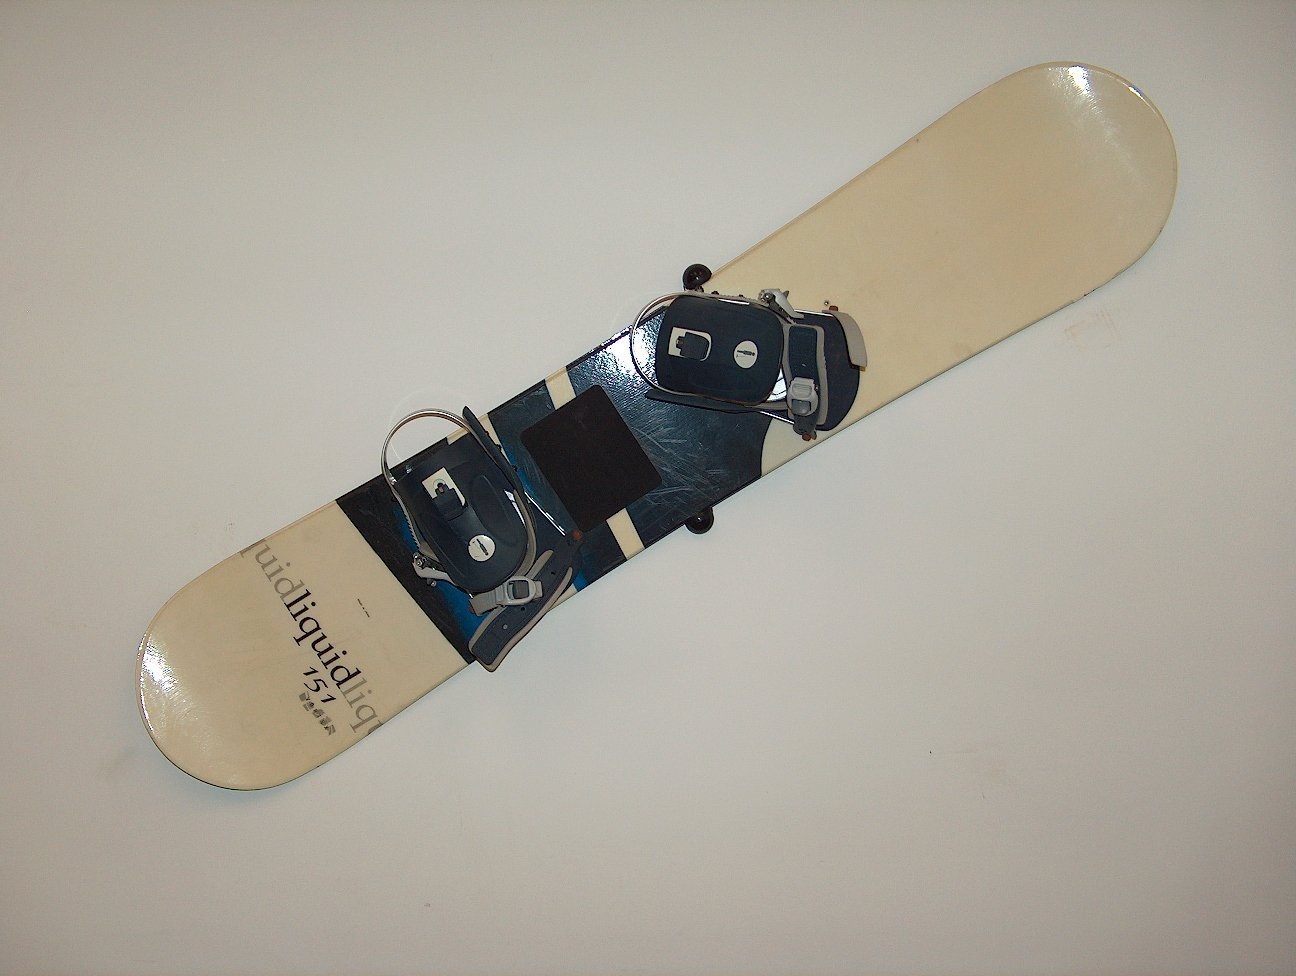 HANGTIME Snowboard Wall Mount - Black